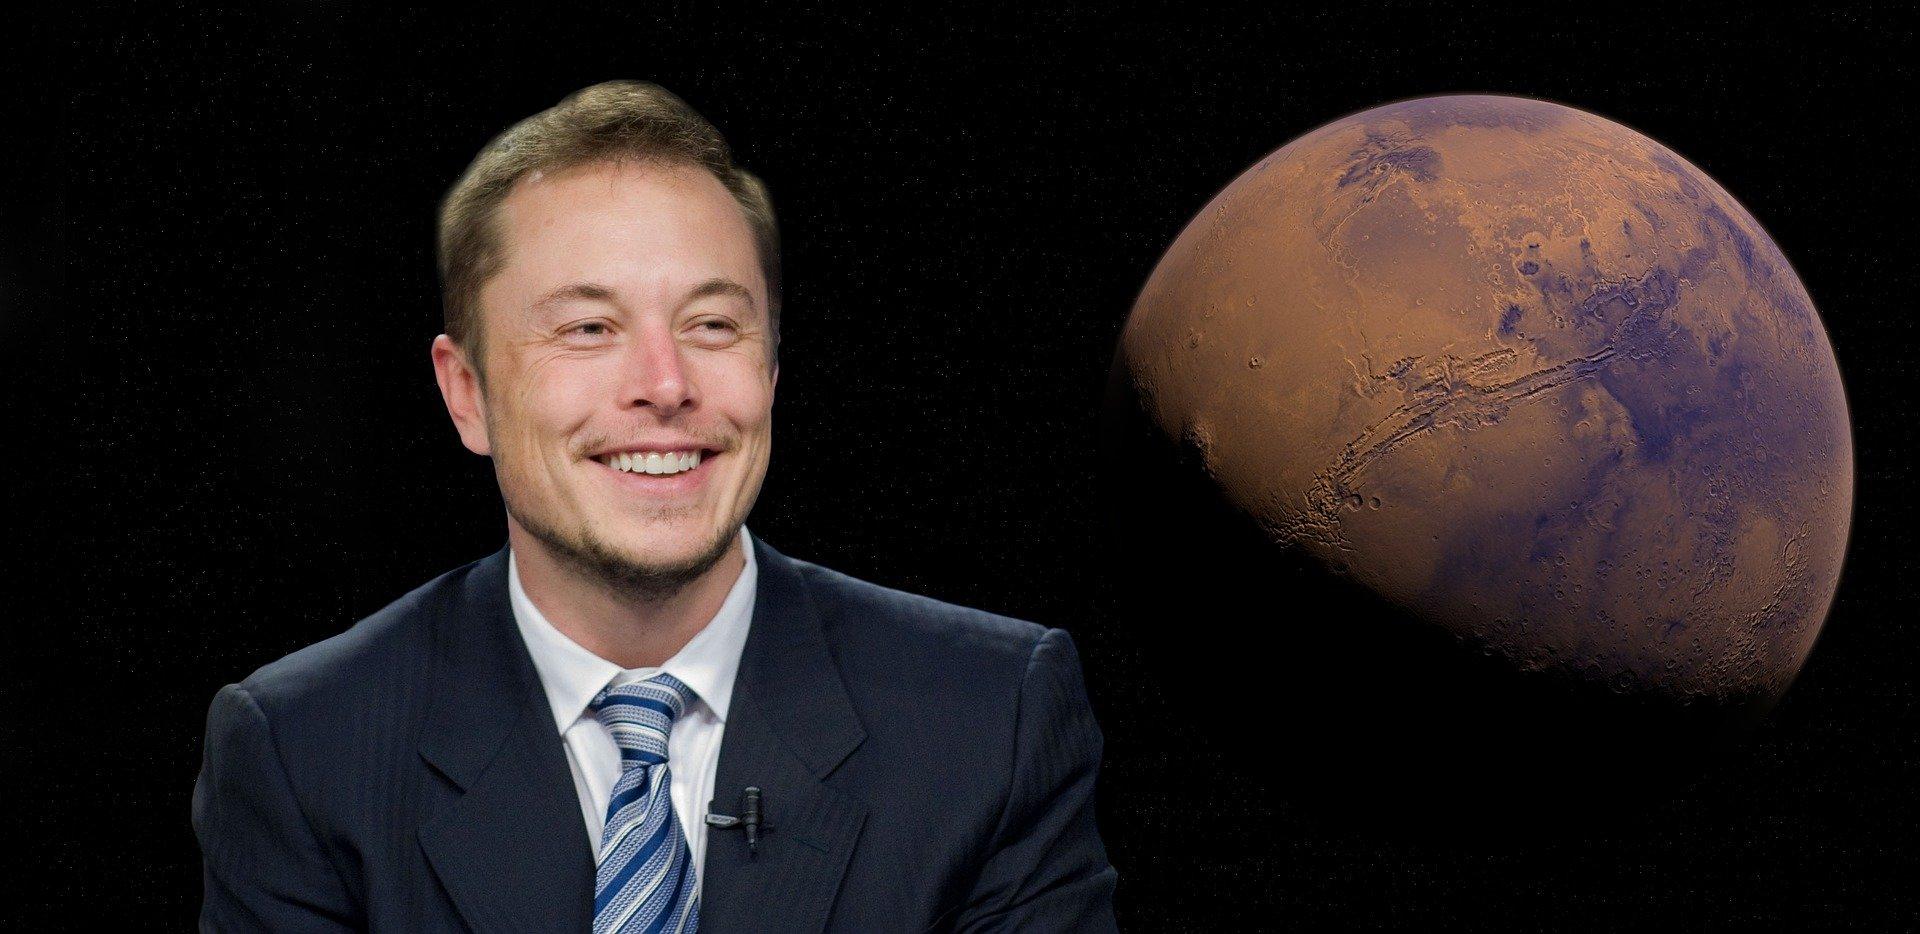 Elon Musk Kinder Name